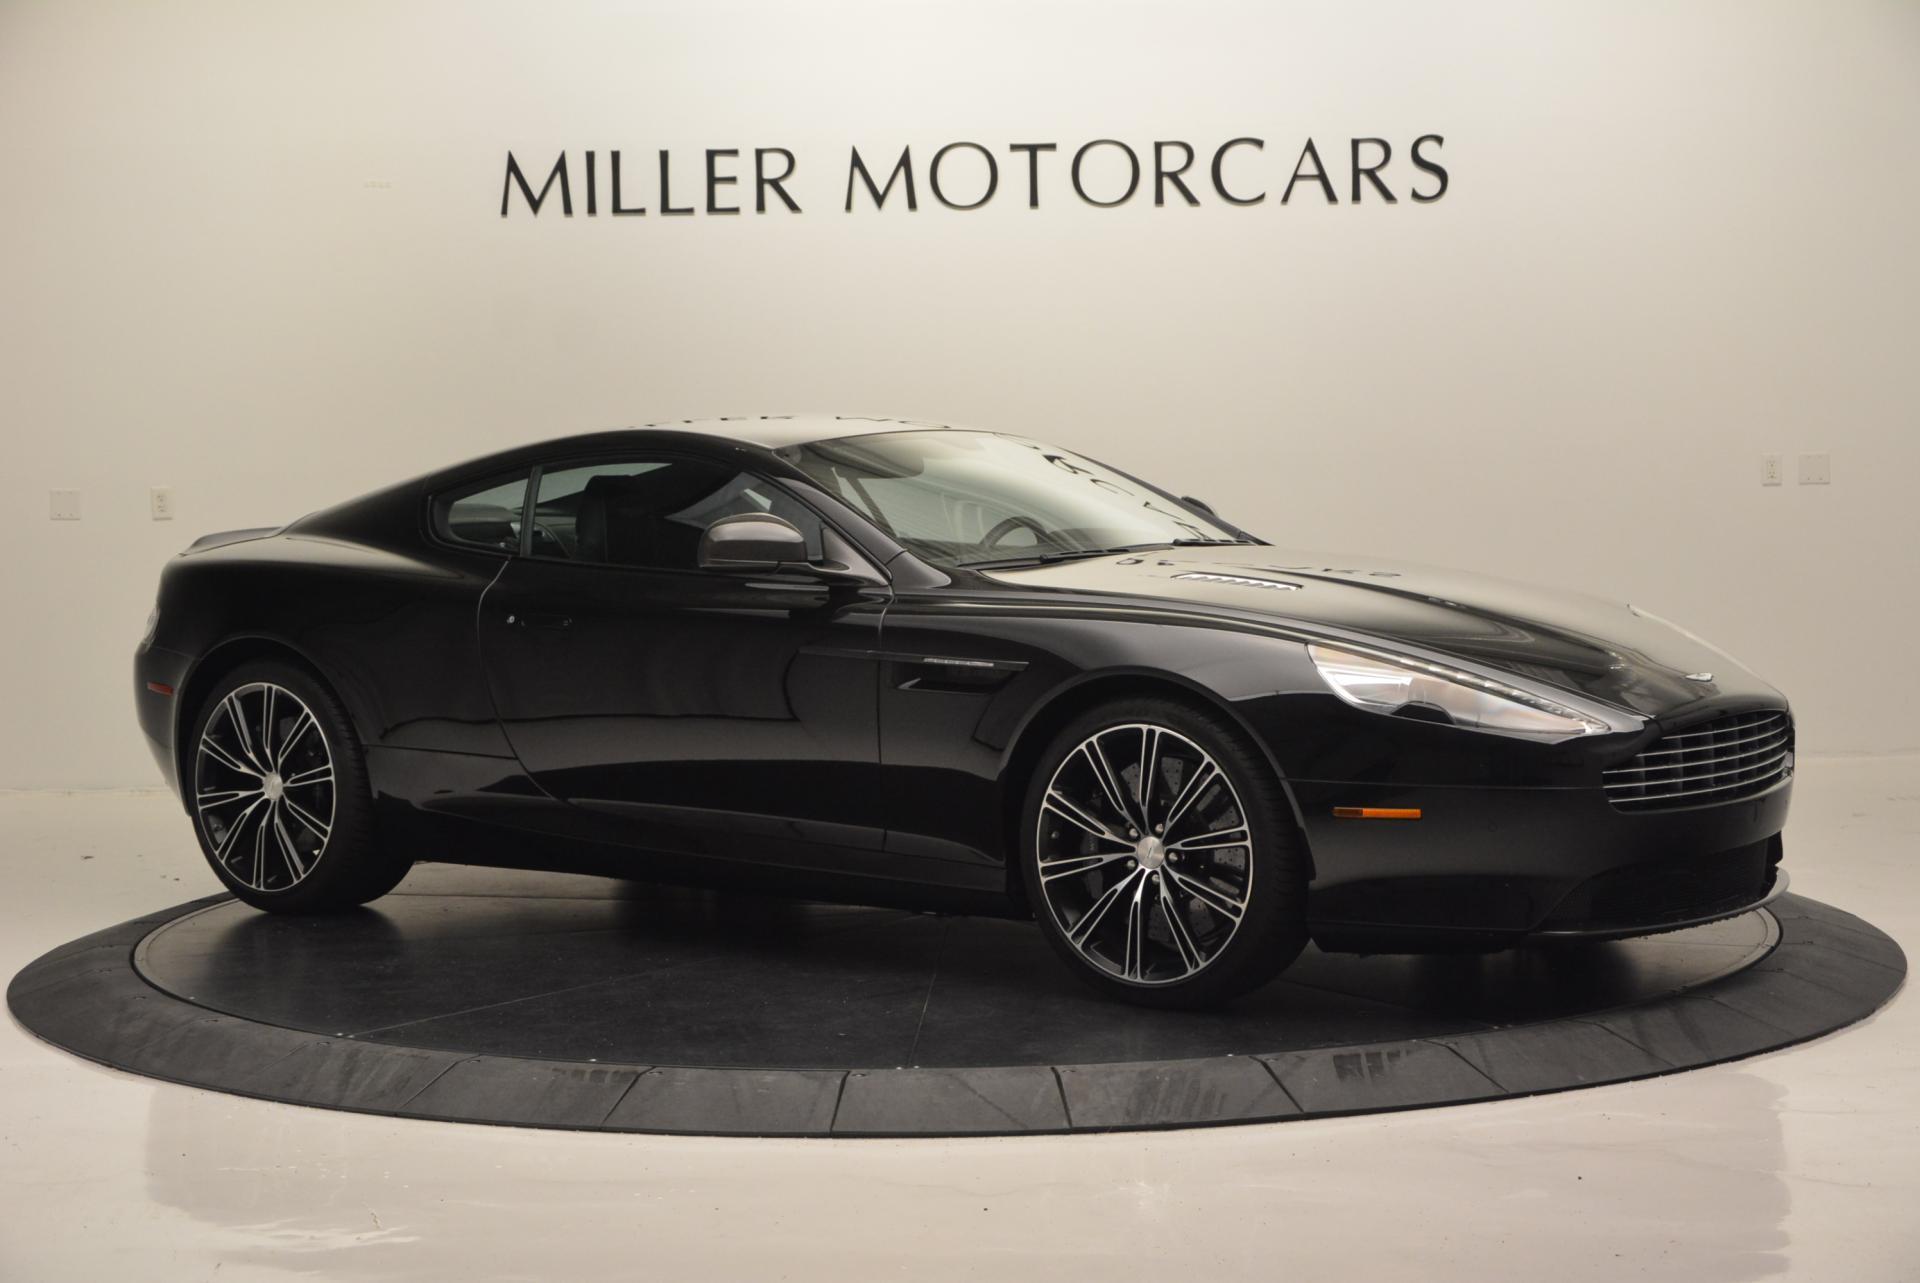 Used 2015 Aston Martin DB9 Carbon Edition For Sale In Greenwich, CT. Alfa Romeo of Greenwich, 7349 528_p10